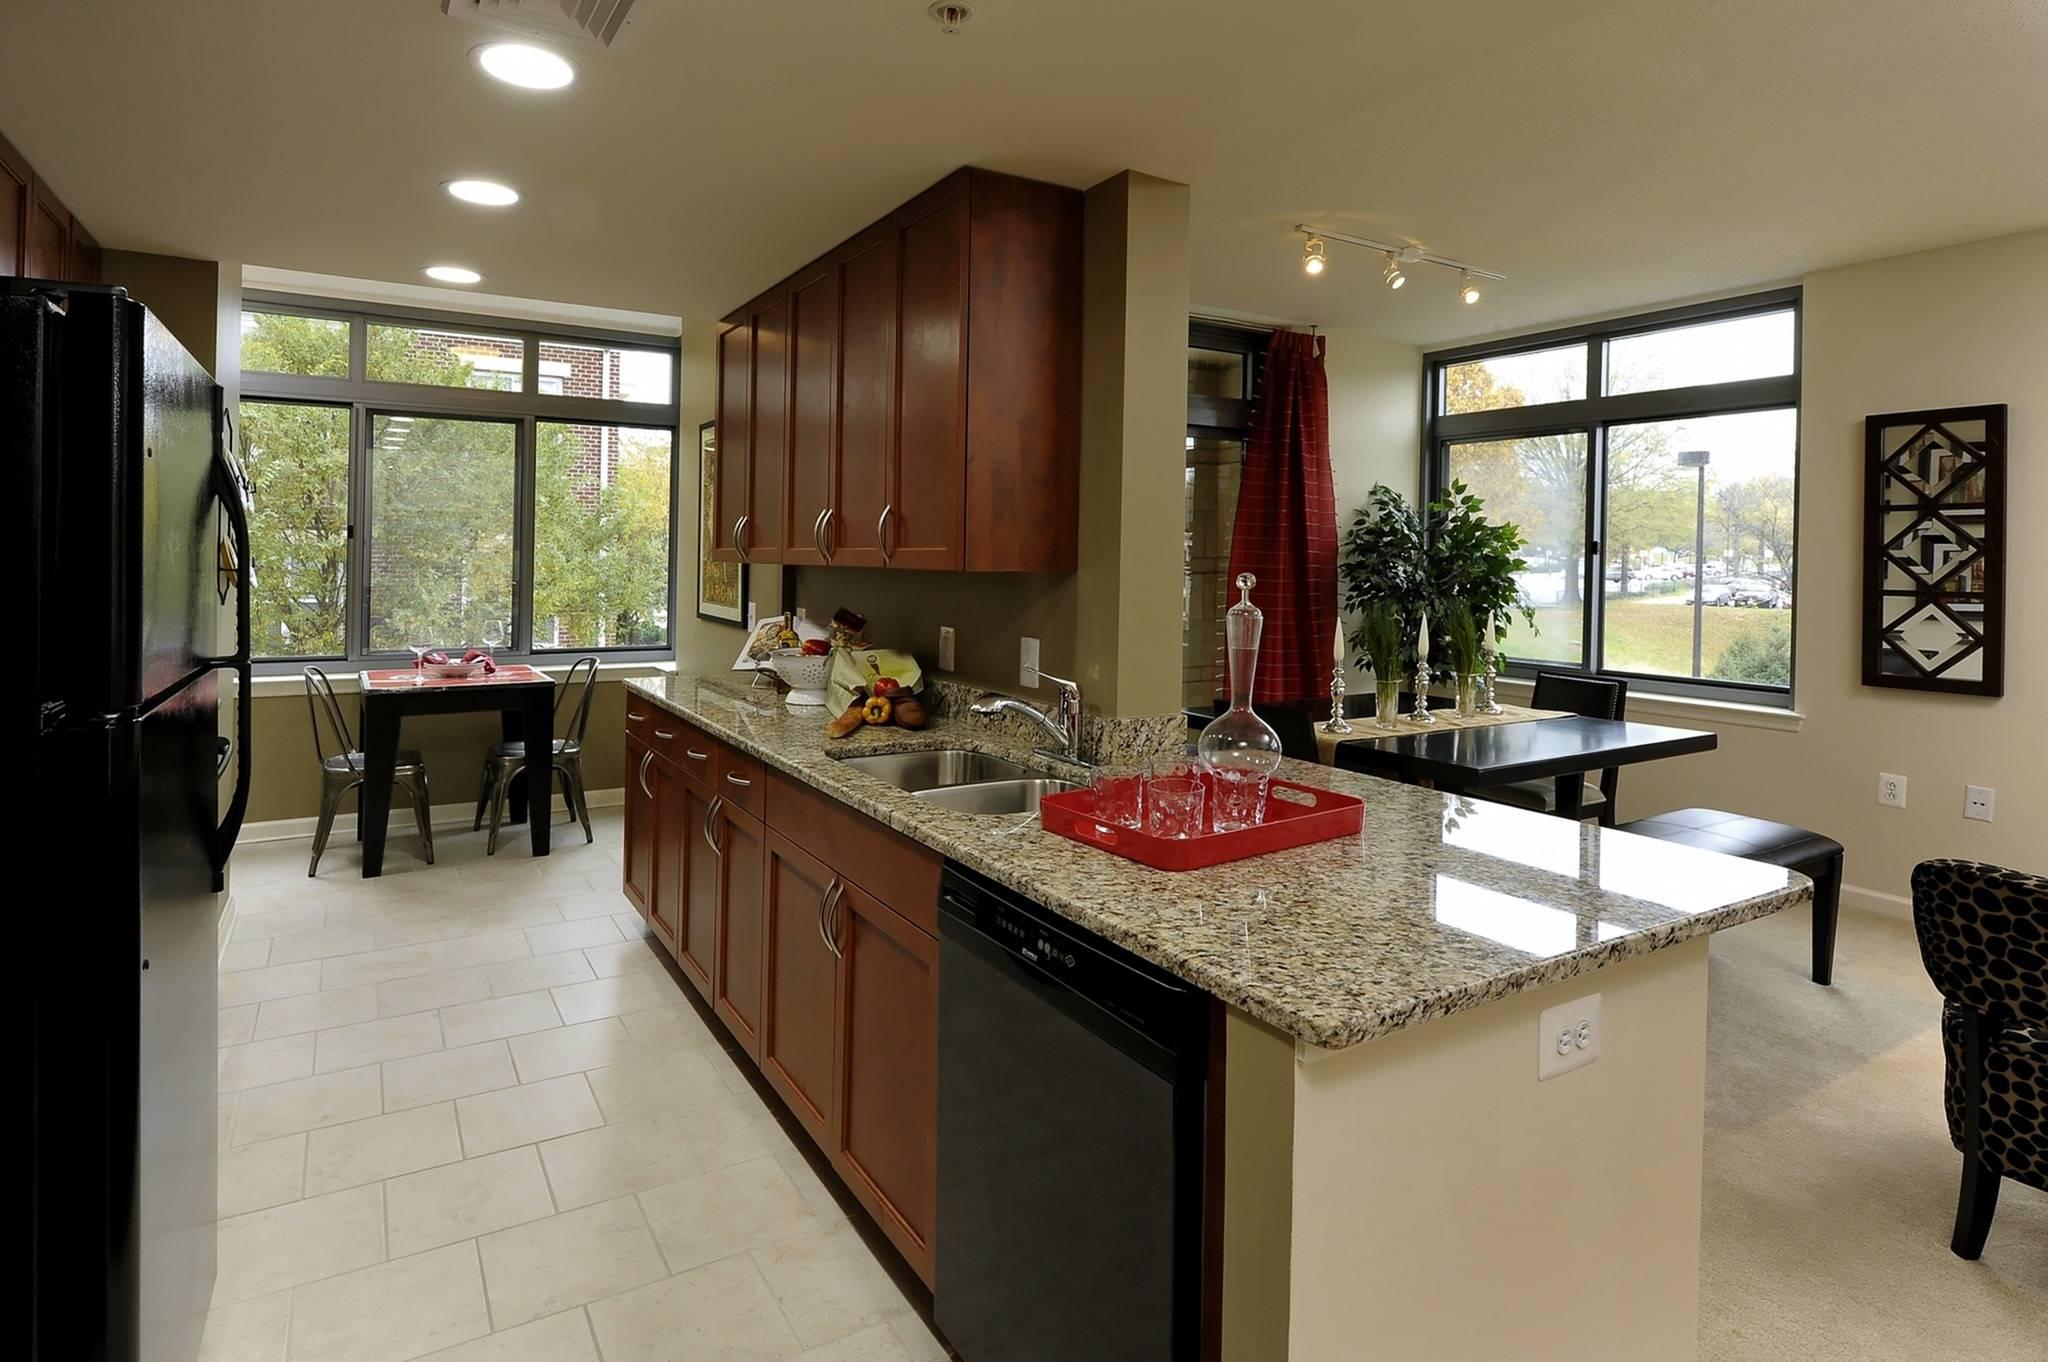 Tiled kitchen flooring